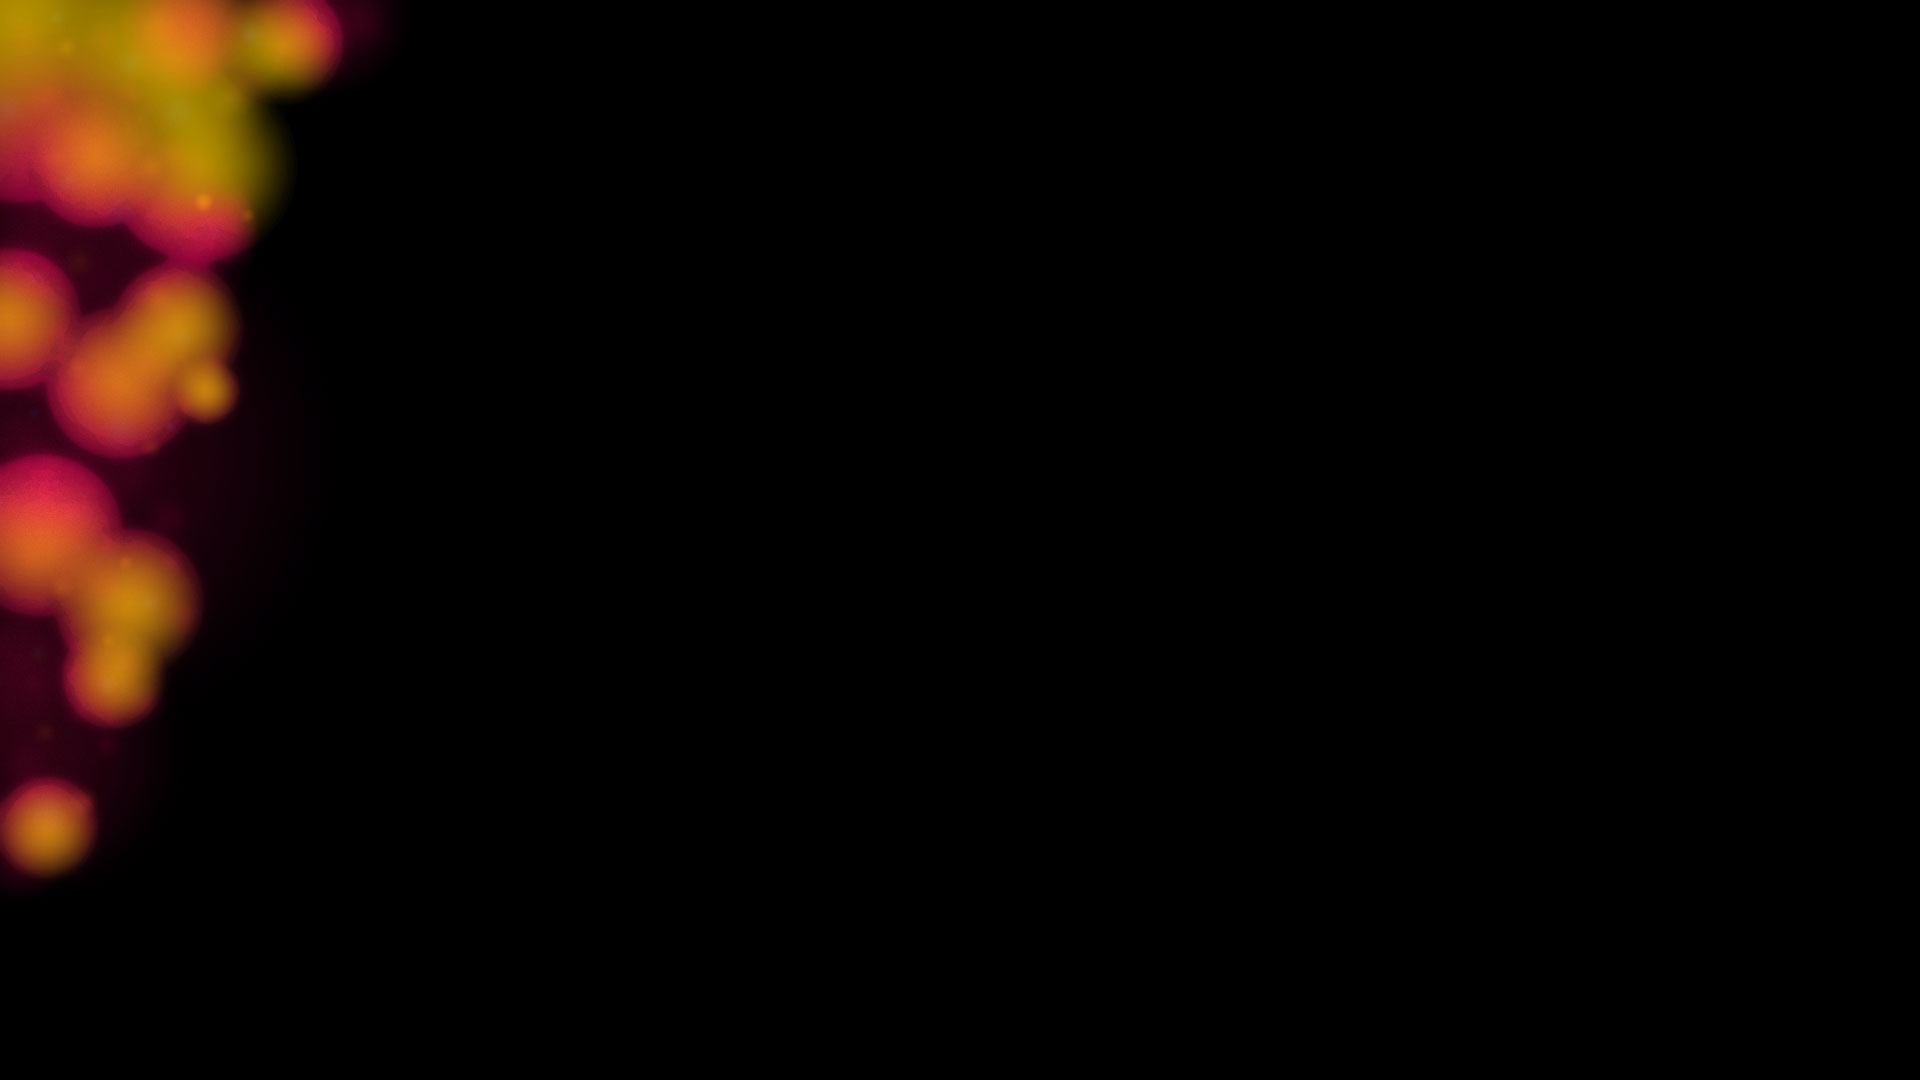 black backgrounds 18235